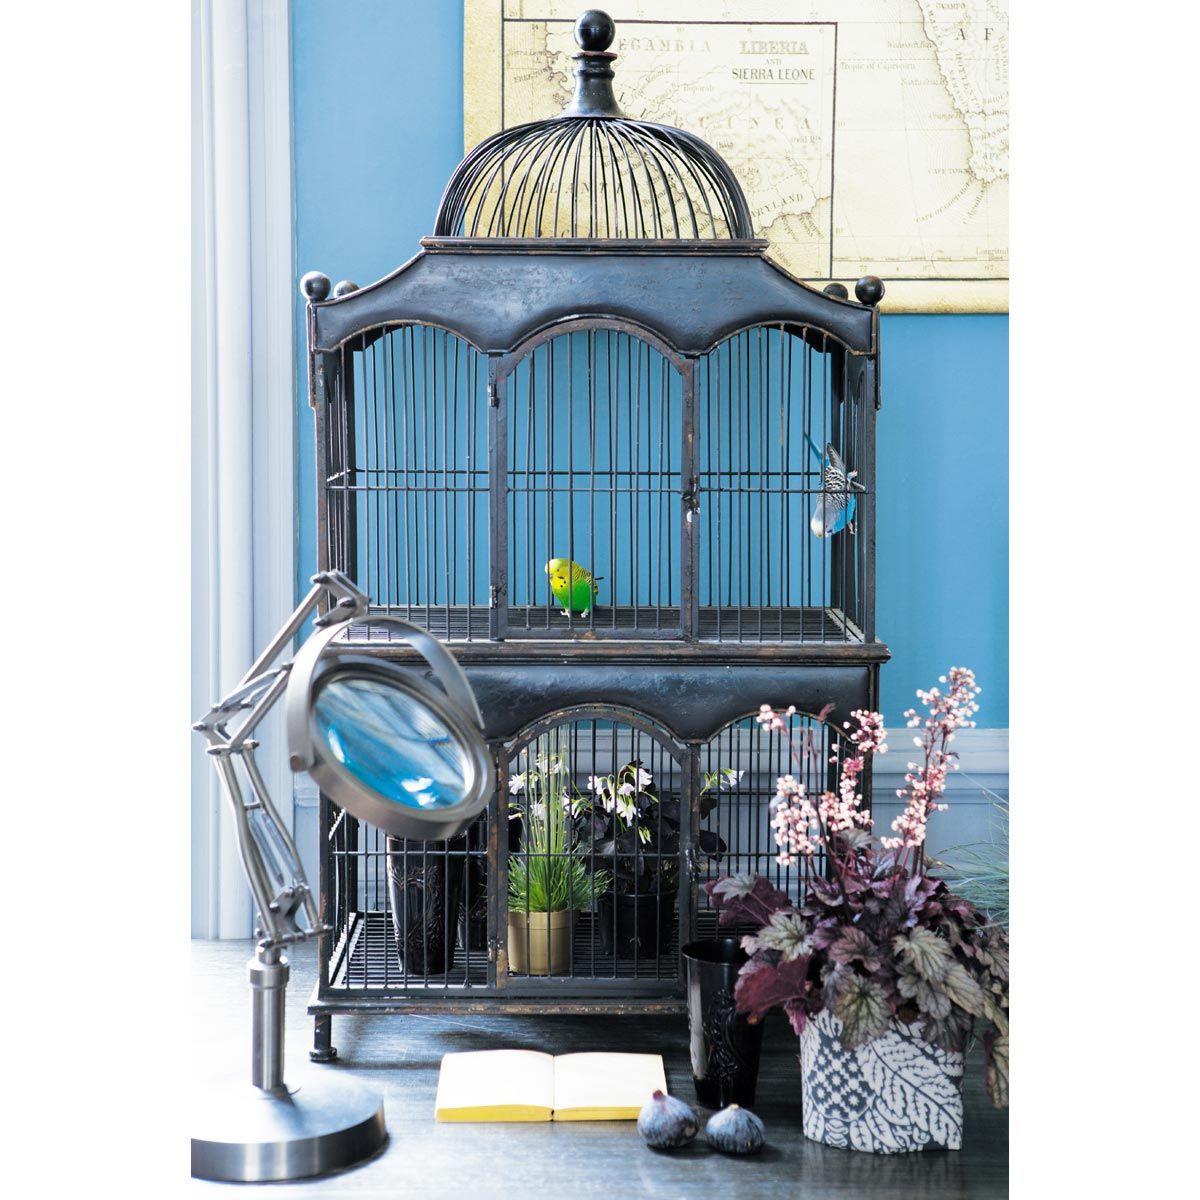 cage vienne maisons du monde h o m e pinterest maison du monde nouvelles maisons et vienne. Black Bedroom Furniture Sets. Home Design Ideas